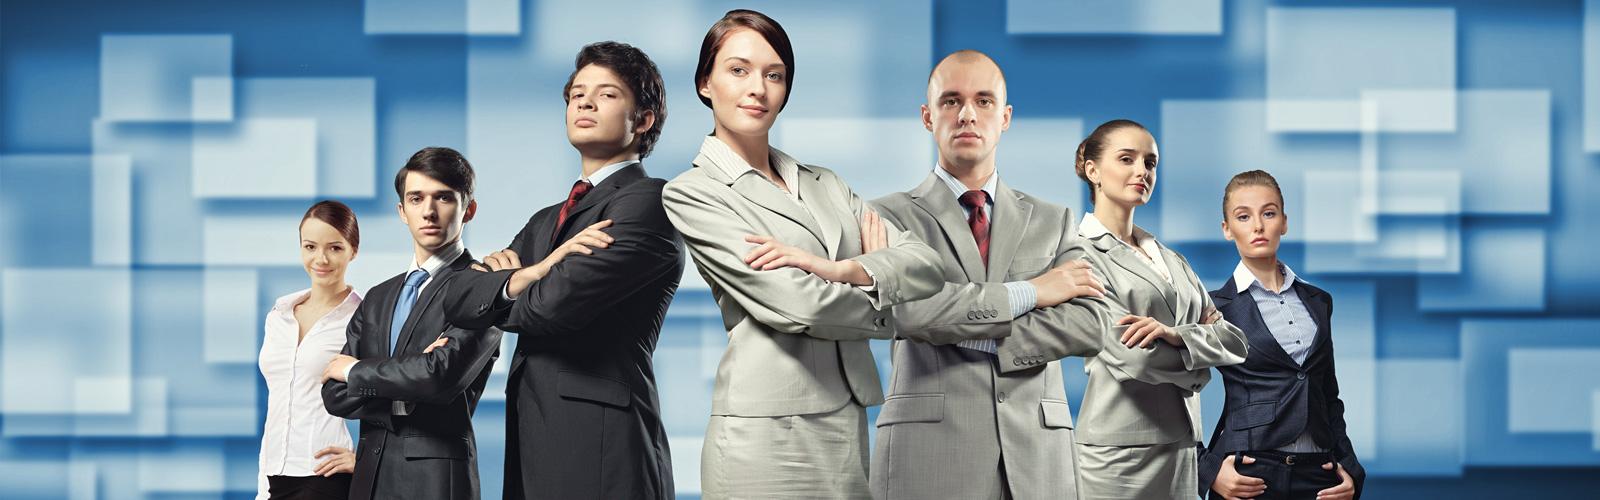 1600-500-slider-business-team